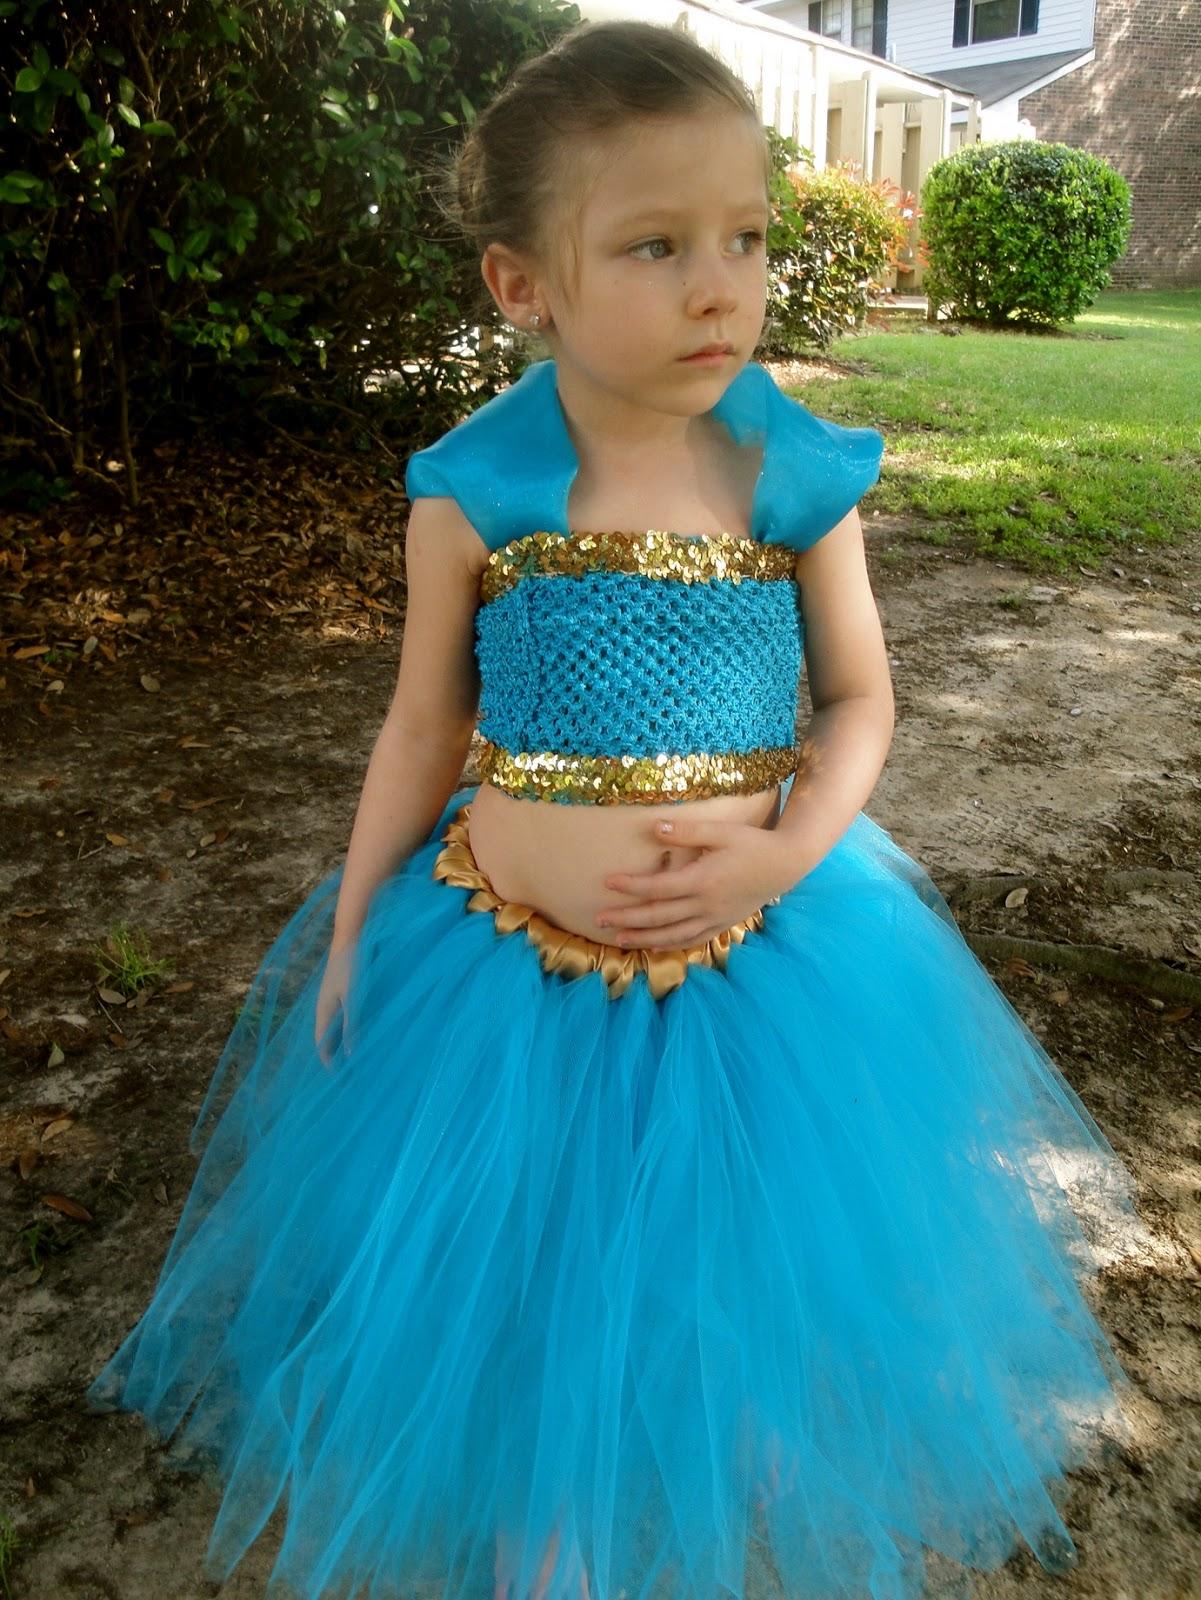 Hollywoodtutu dresses: Princess Jasmine tutu outfit costume